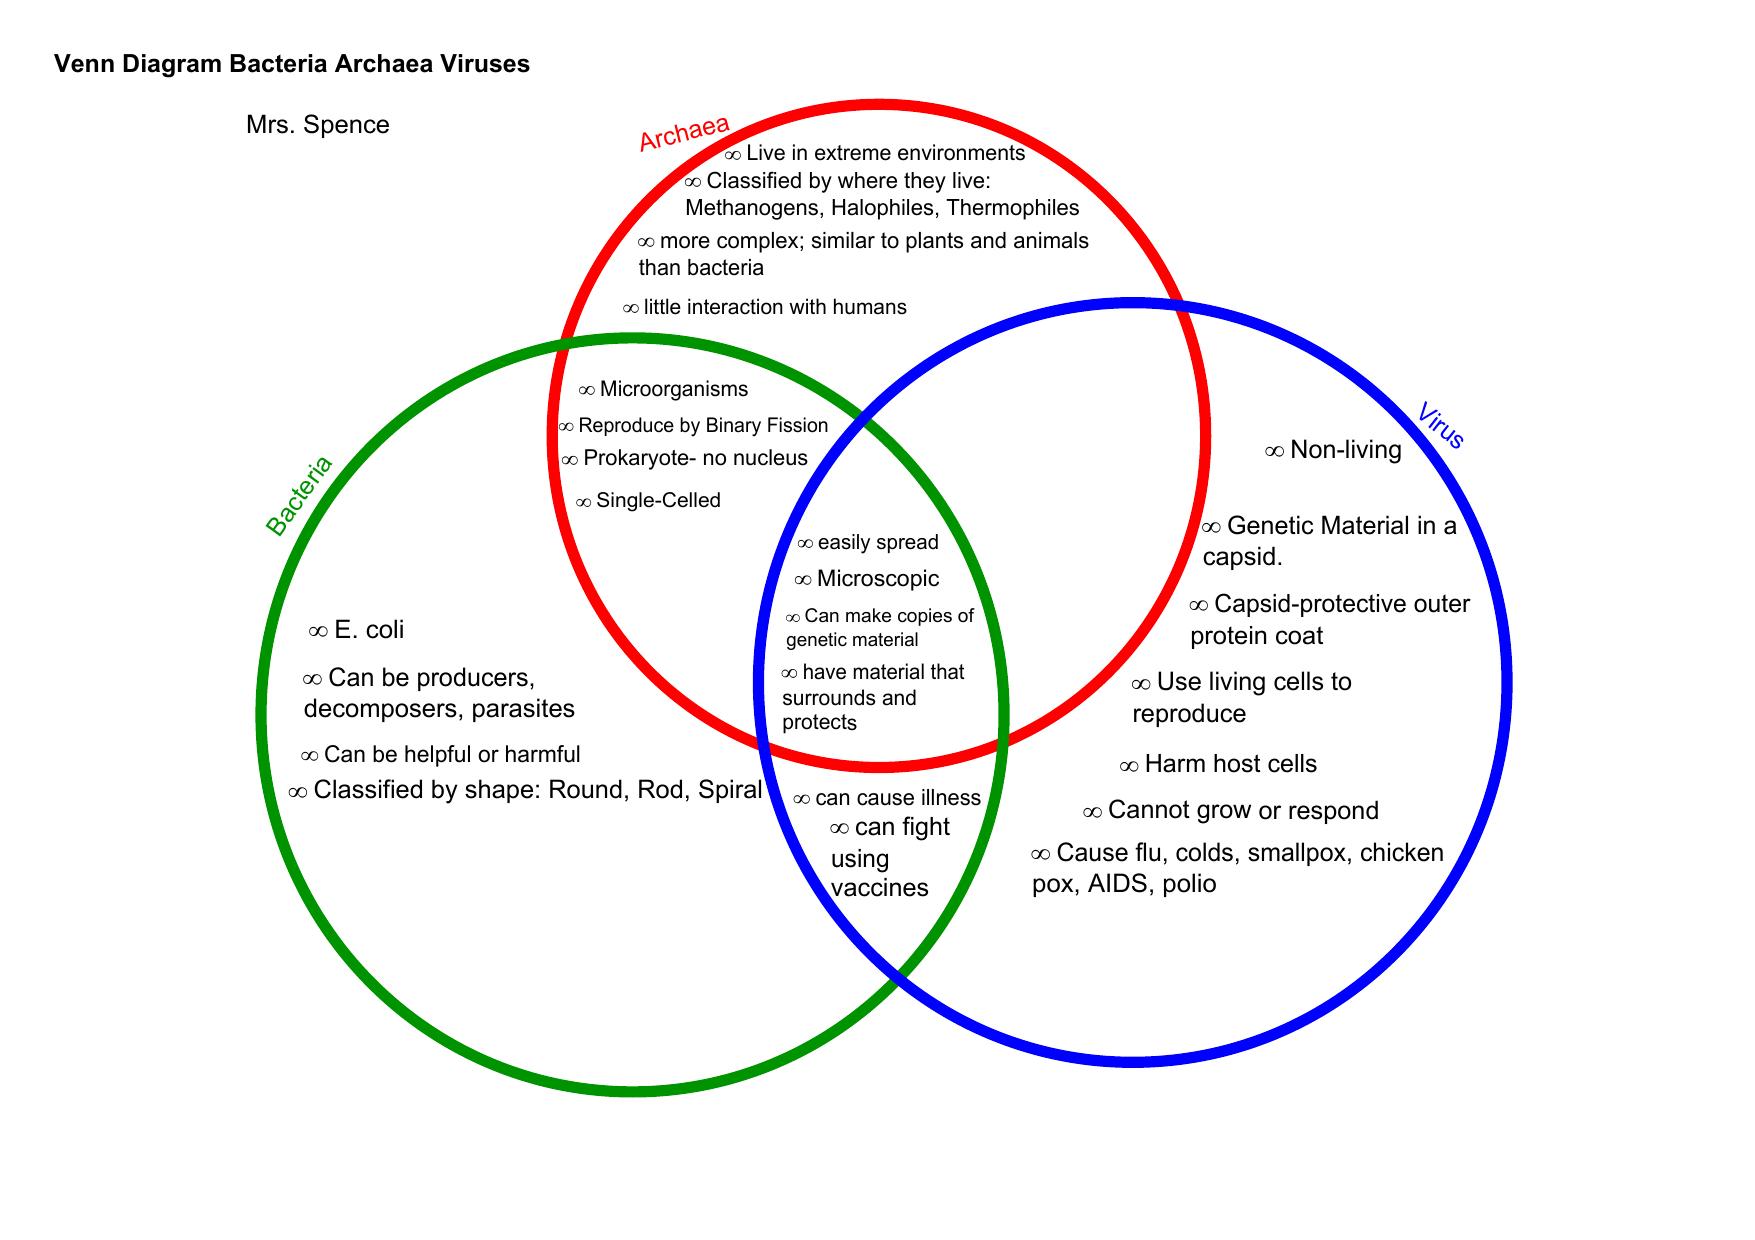 Bacteria And Virus Venn Diagram Venn Diagram Bacteria Archaea Viruses